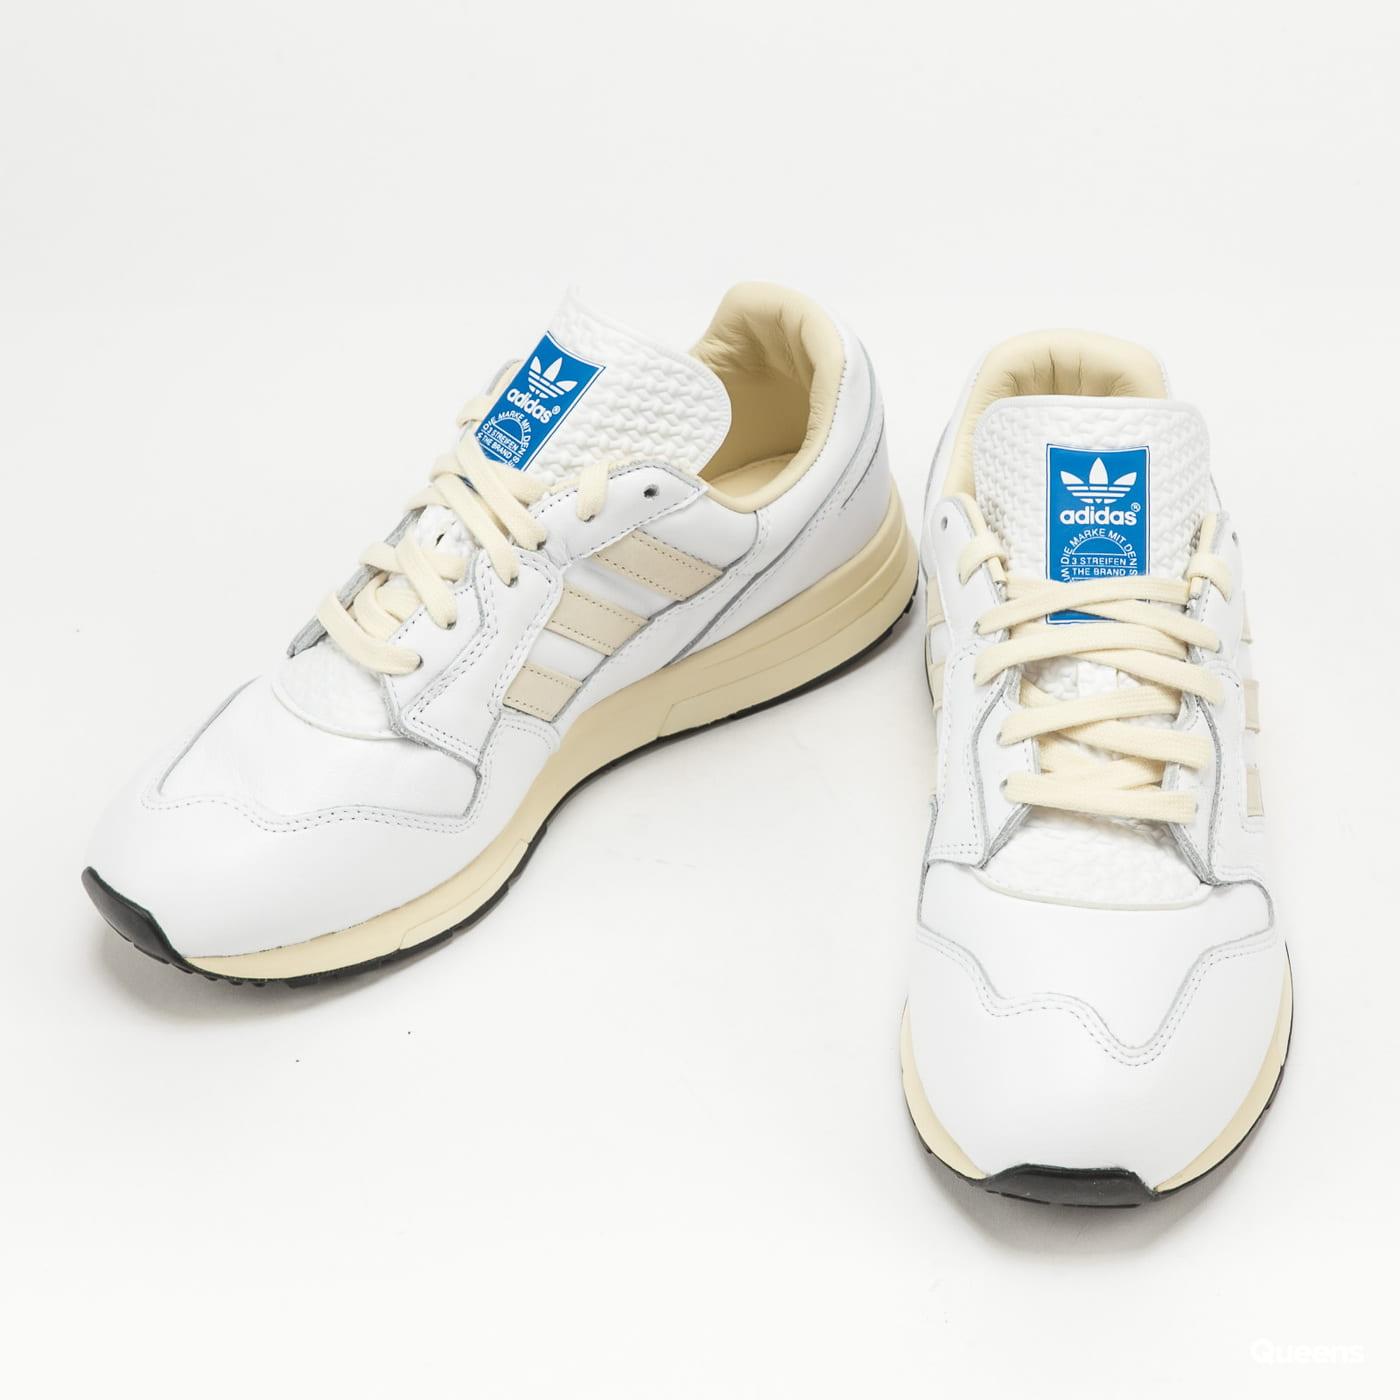 adidas Originals ZX 420 ftwwht / cwhite / cblack